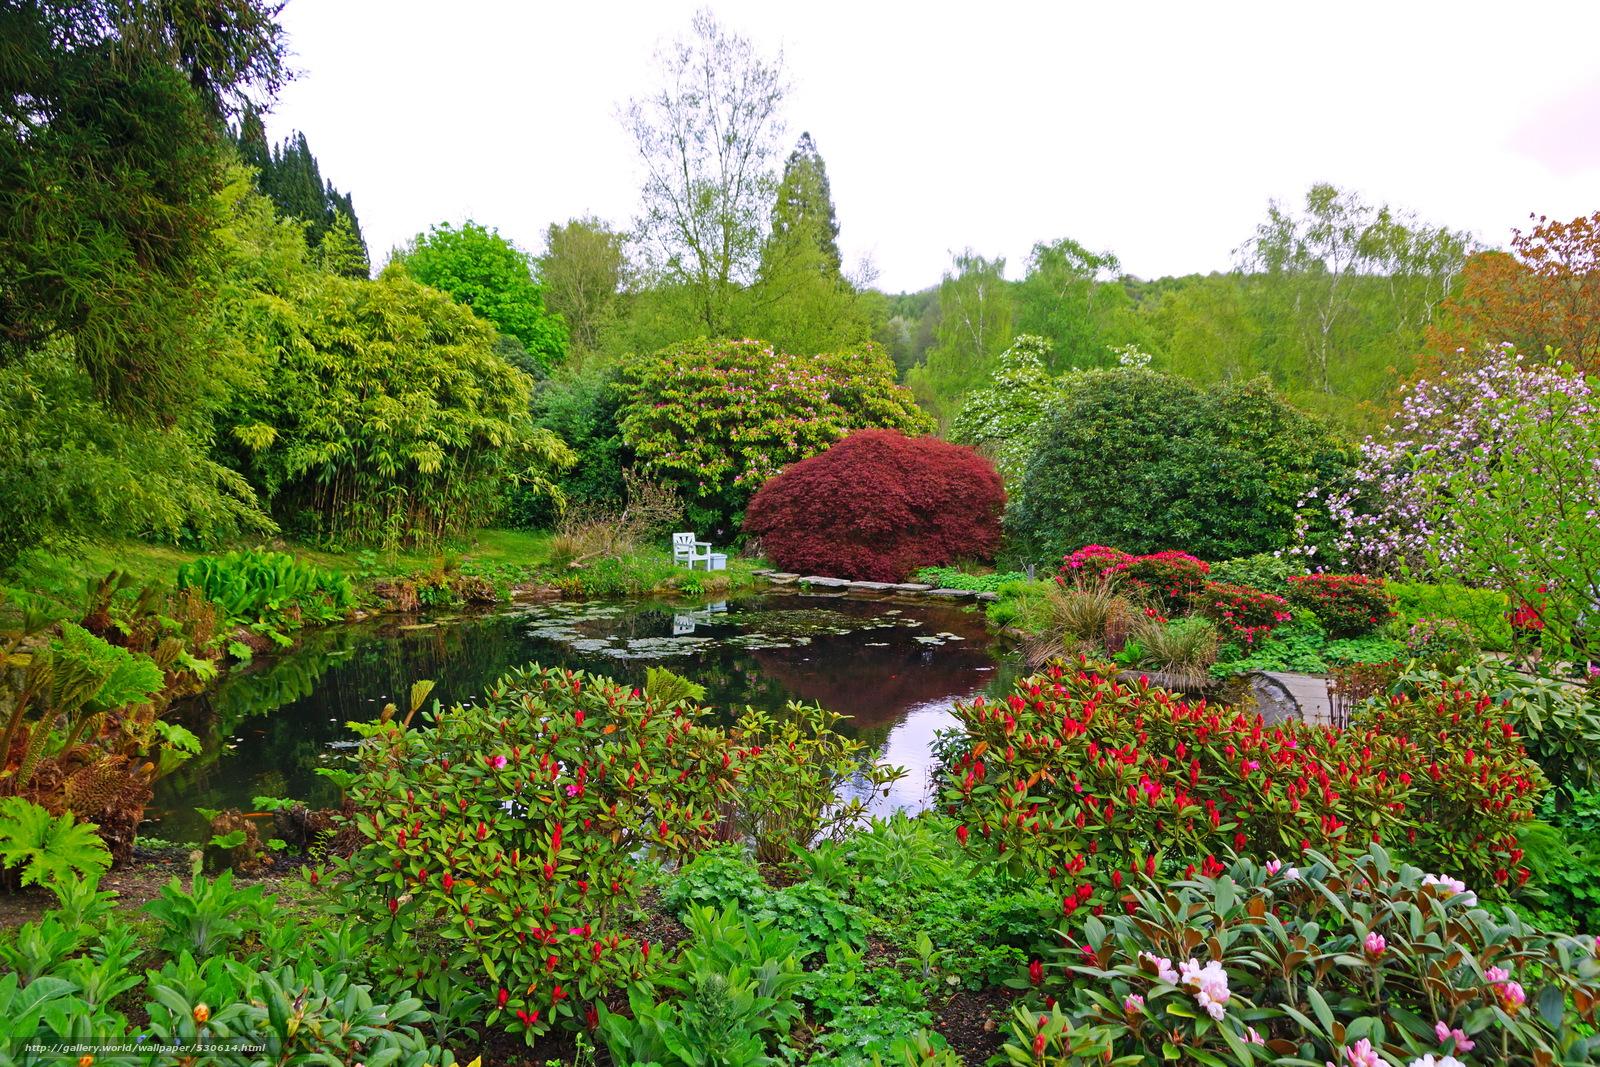 Tlcharger Fond D 39 Ecran Jardin Angleterre Tang Sevenoaks